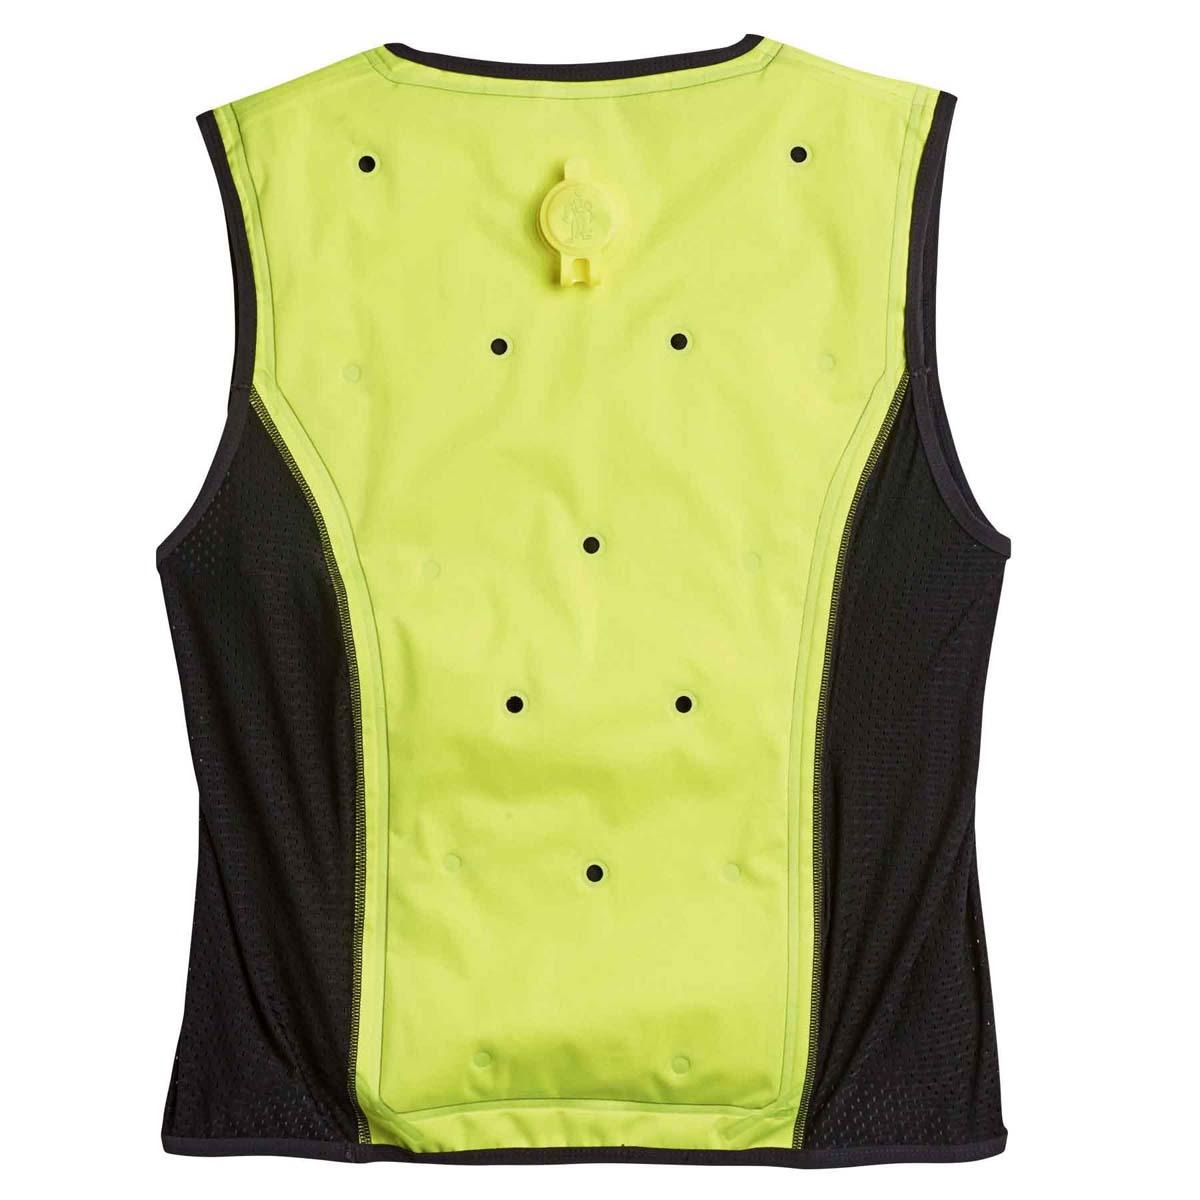 6685 3XL Lime Dry Evaporative Cooling Vest